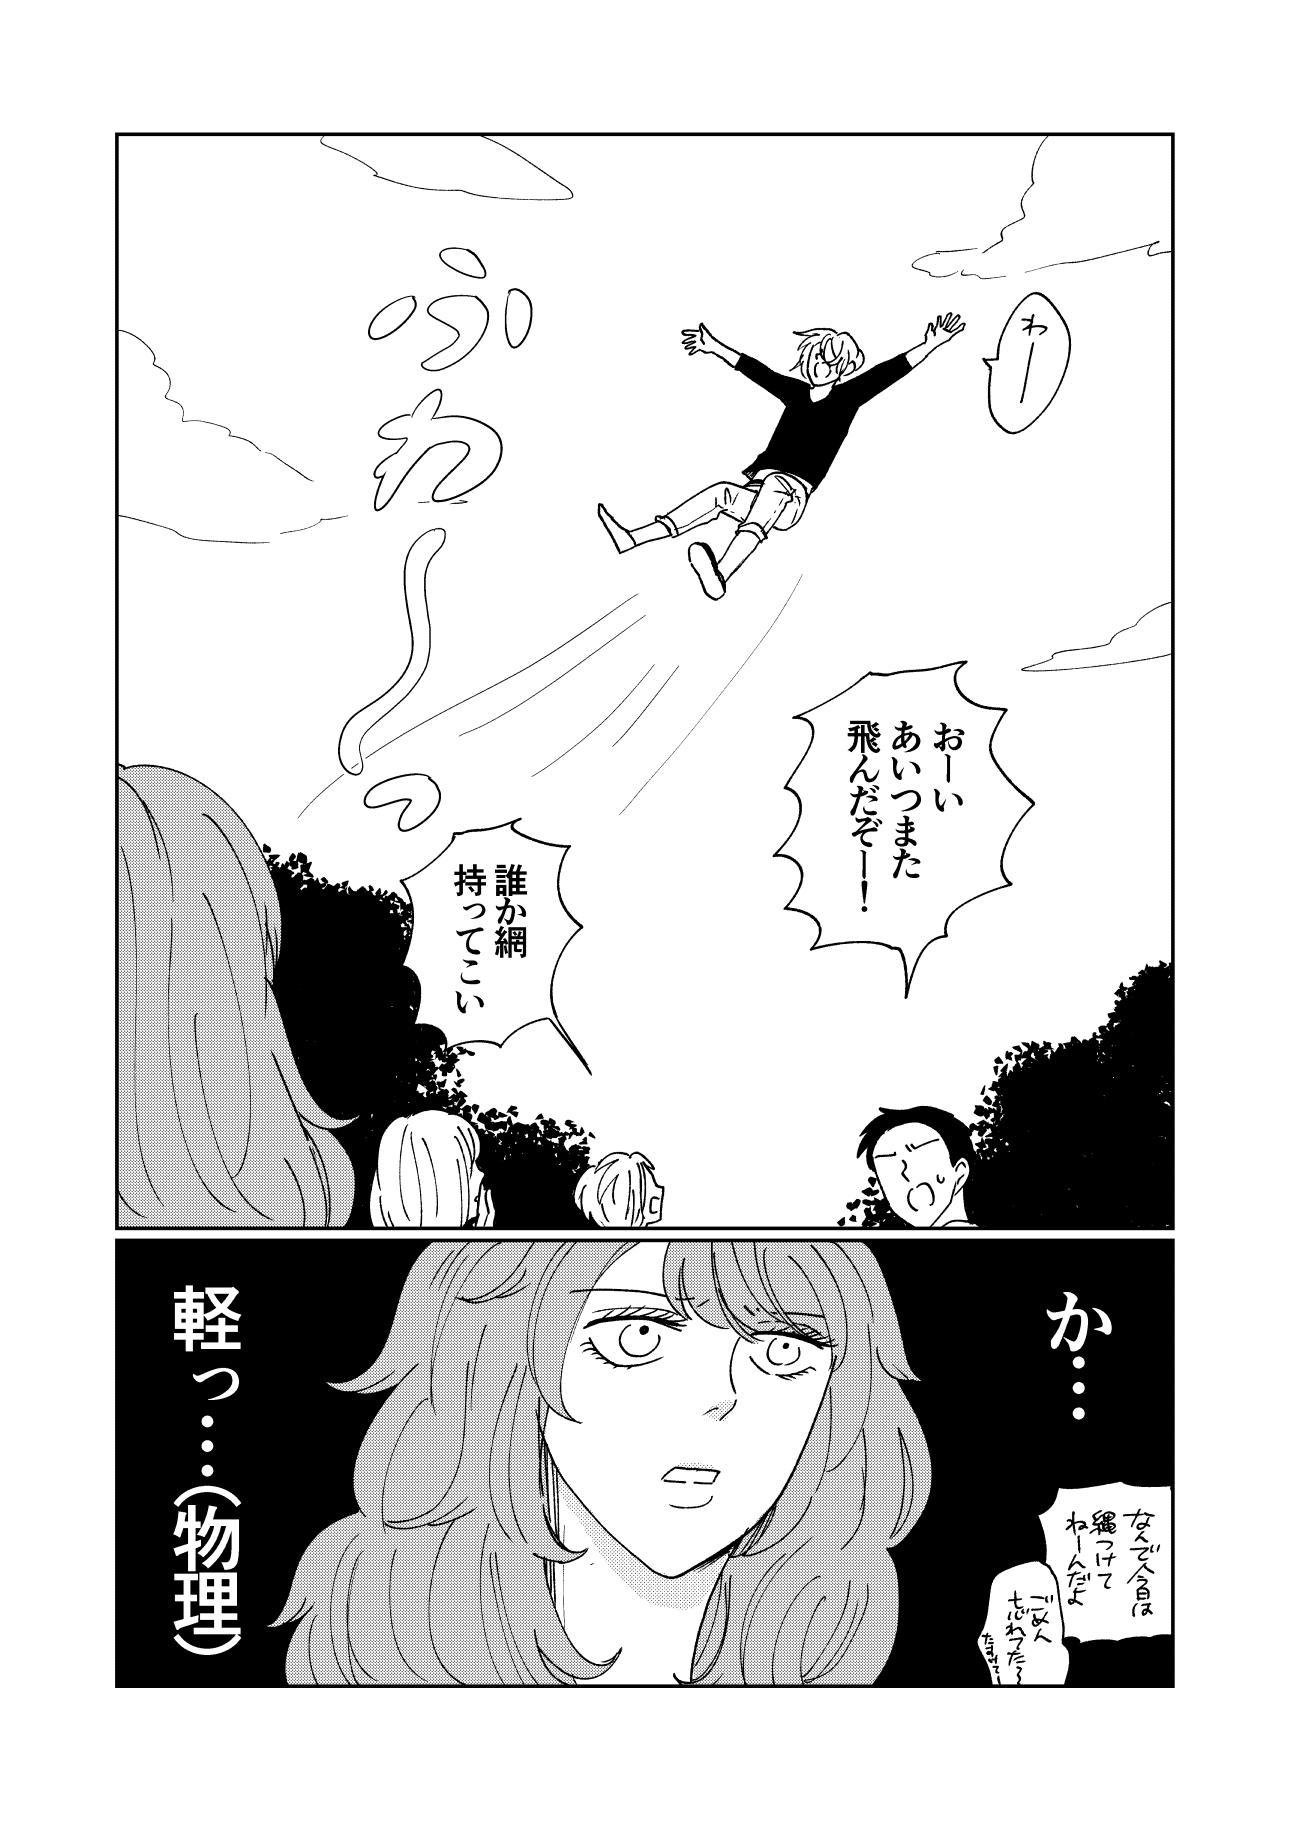 f:id:kanemotonomukuu:20190212204725j:plain